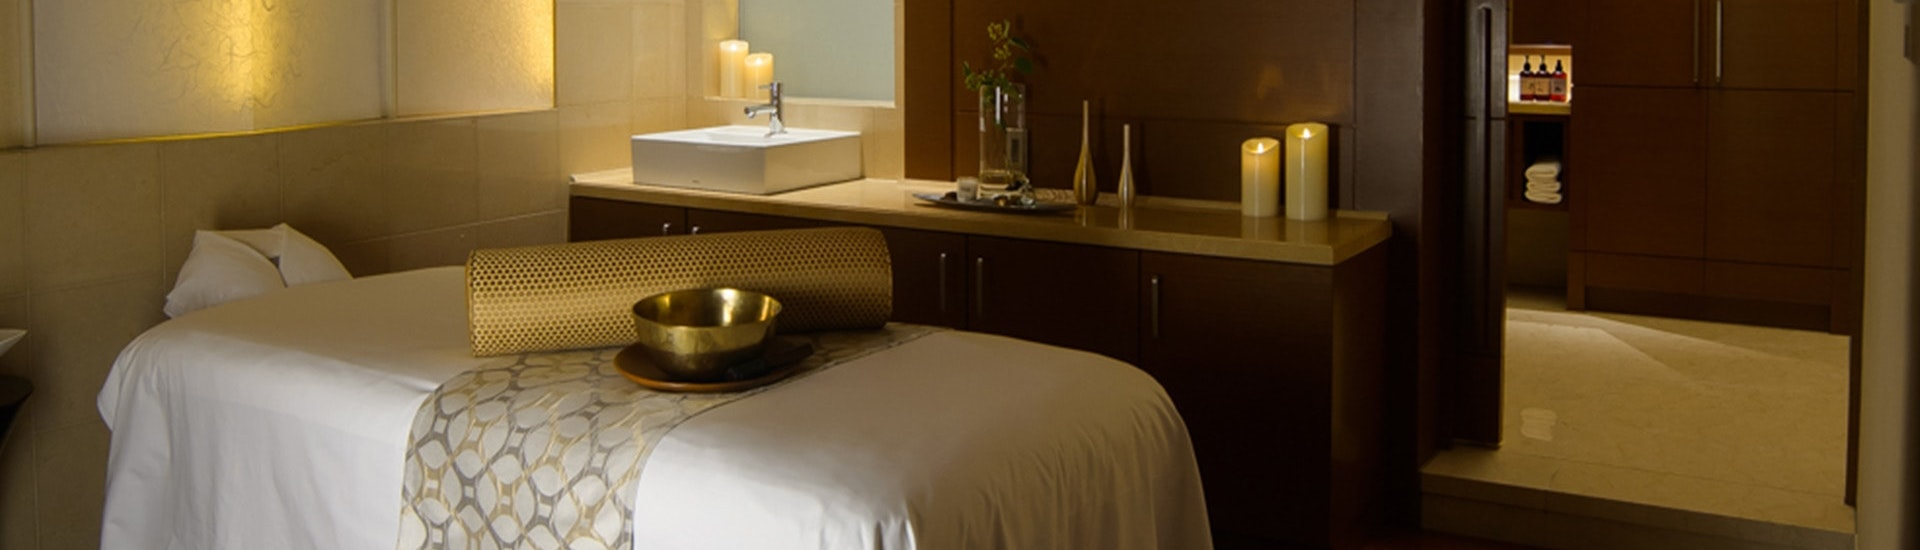 MEGURI SPA & WELLNESS(メグリ スパ アンド ウェルネス)/インターコンチネンタルホテル大阪